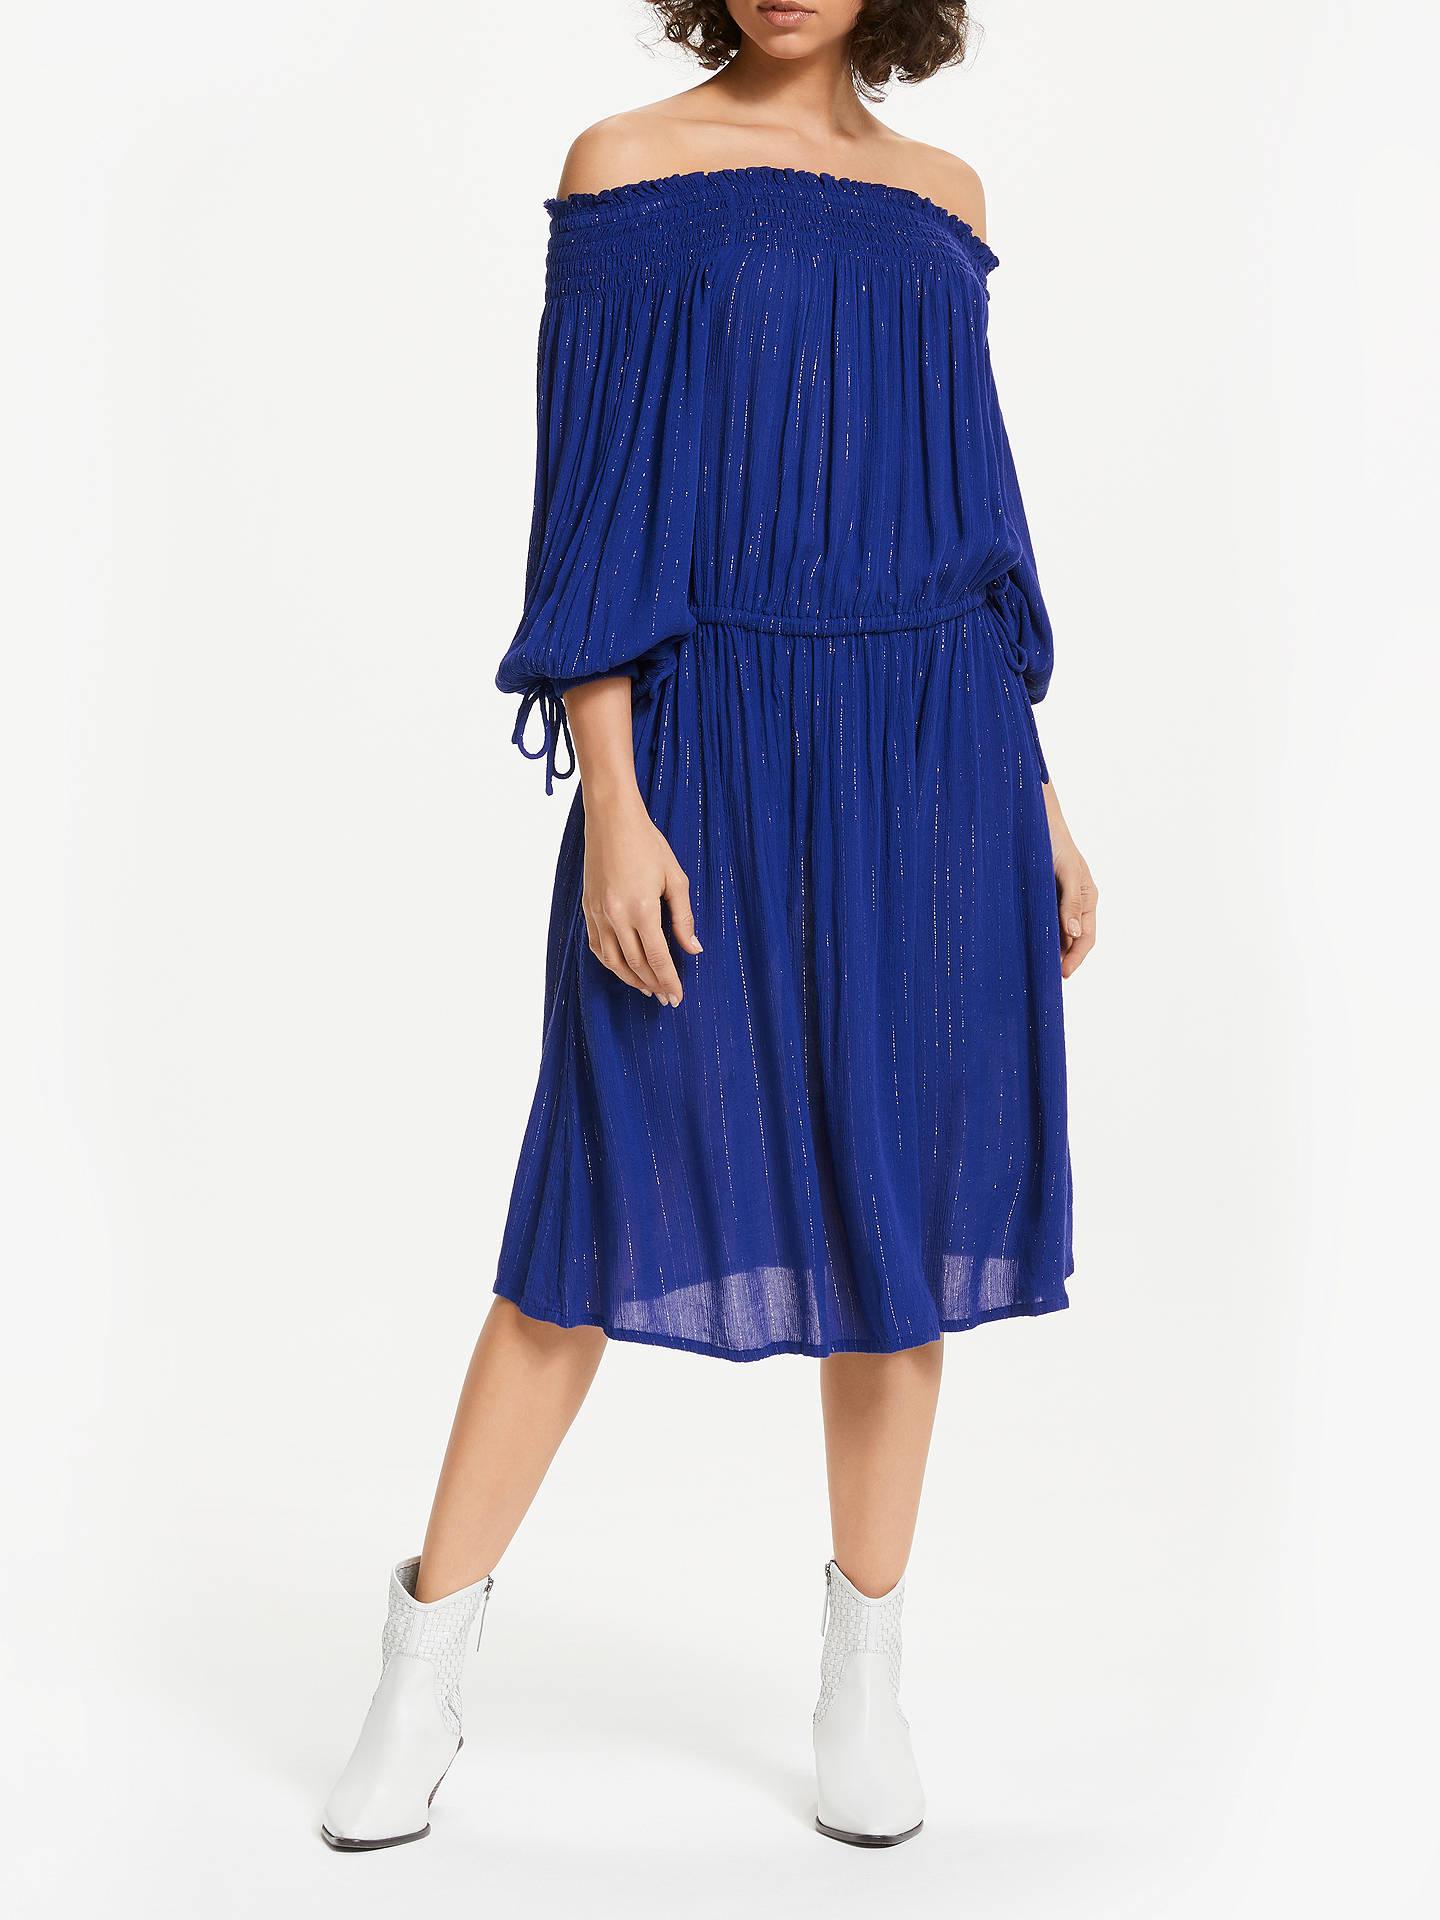 498115b239 BuyAND OR Monique Off Shoulder Glitter Stripe Midi Dress